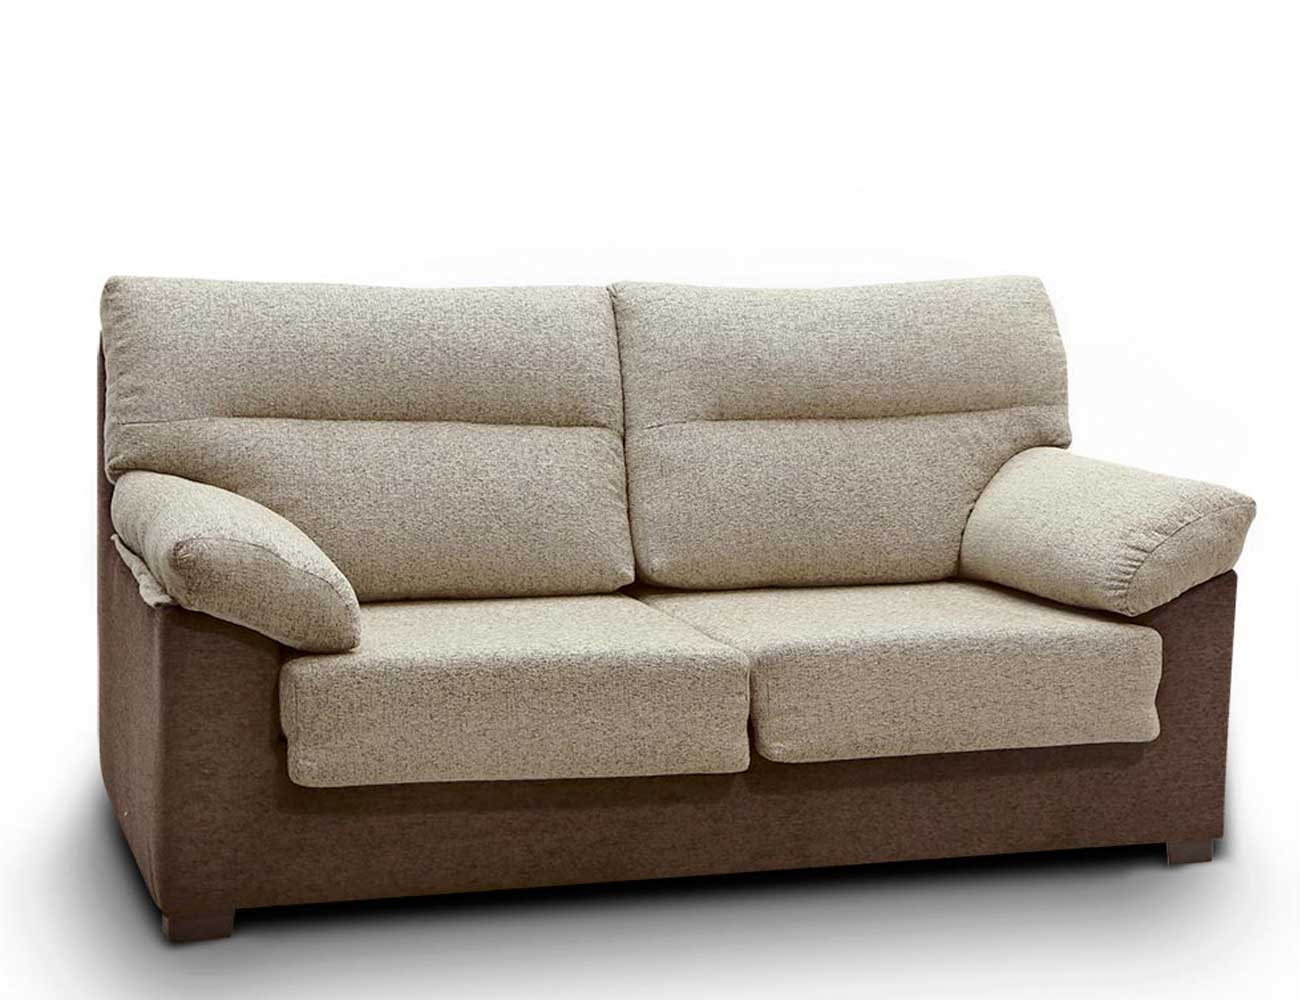 Sofa 3 plazas barato11